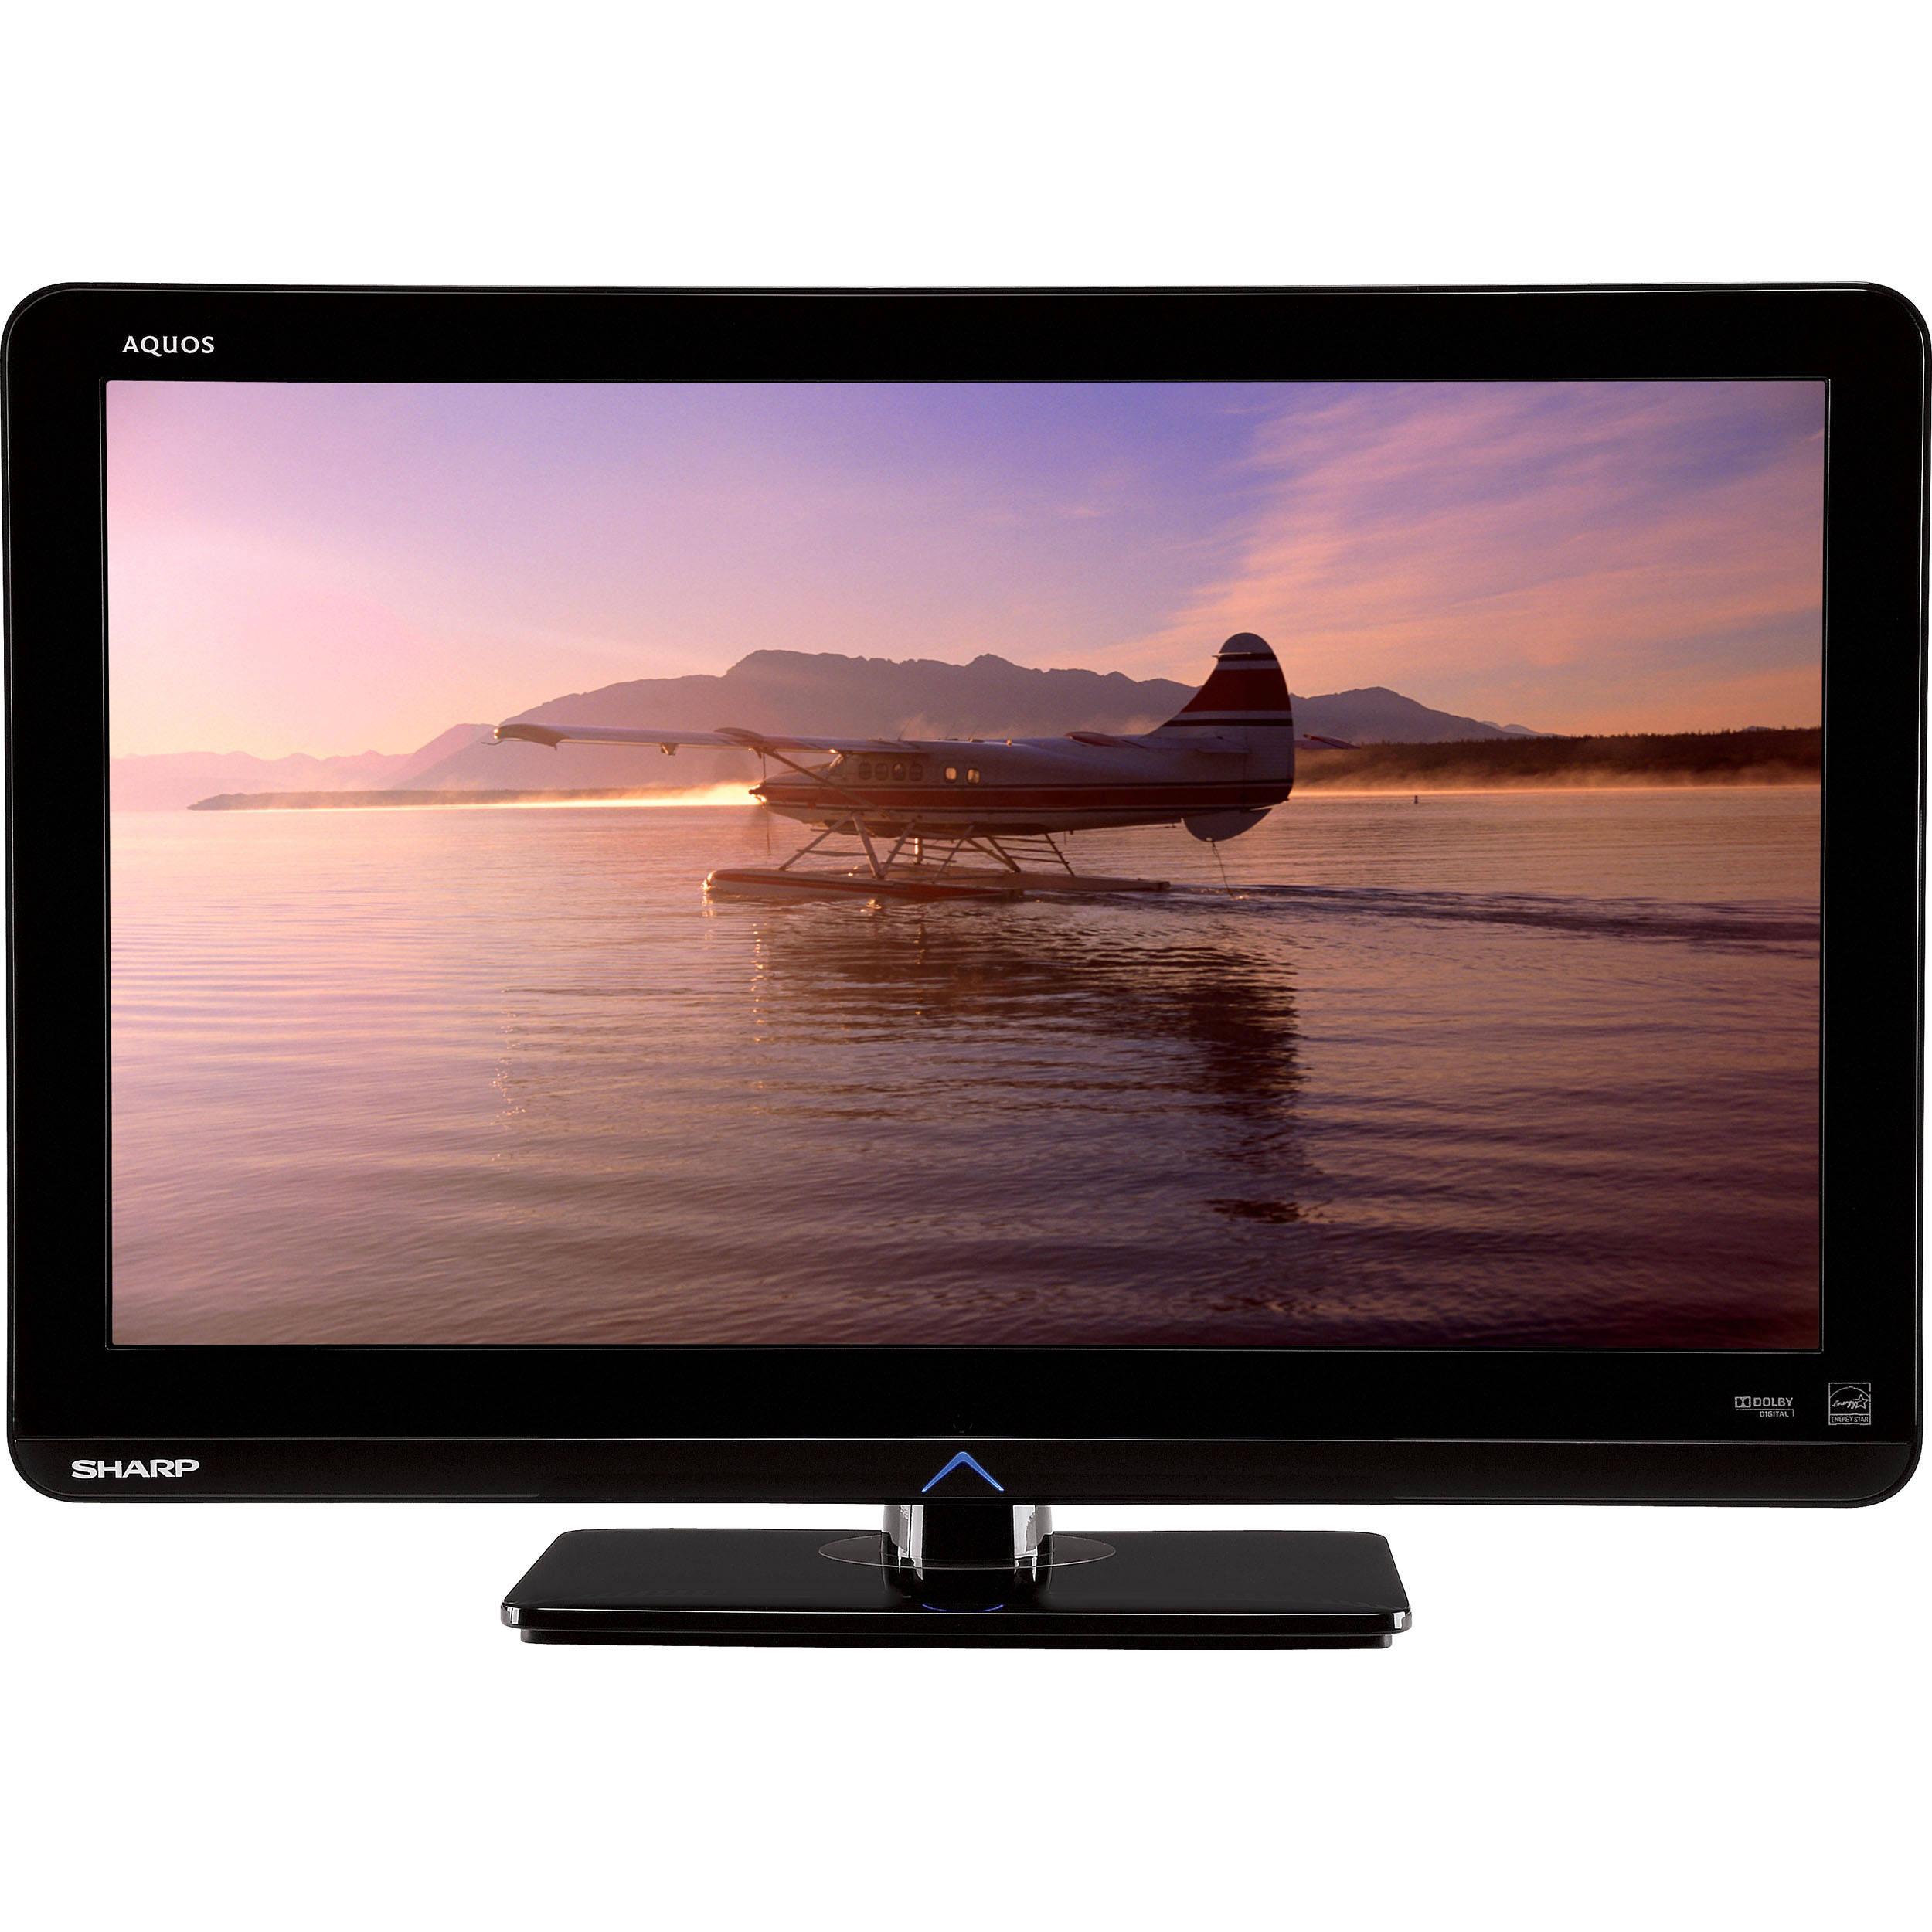 Sharp LC 19LS410UT 19 AQUOS HD LED LCD TV